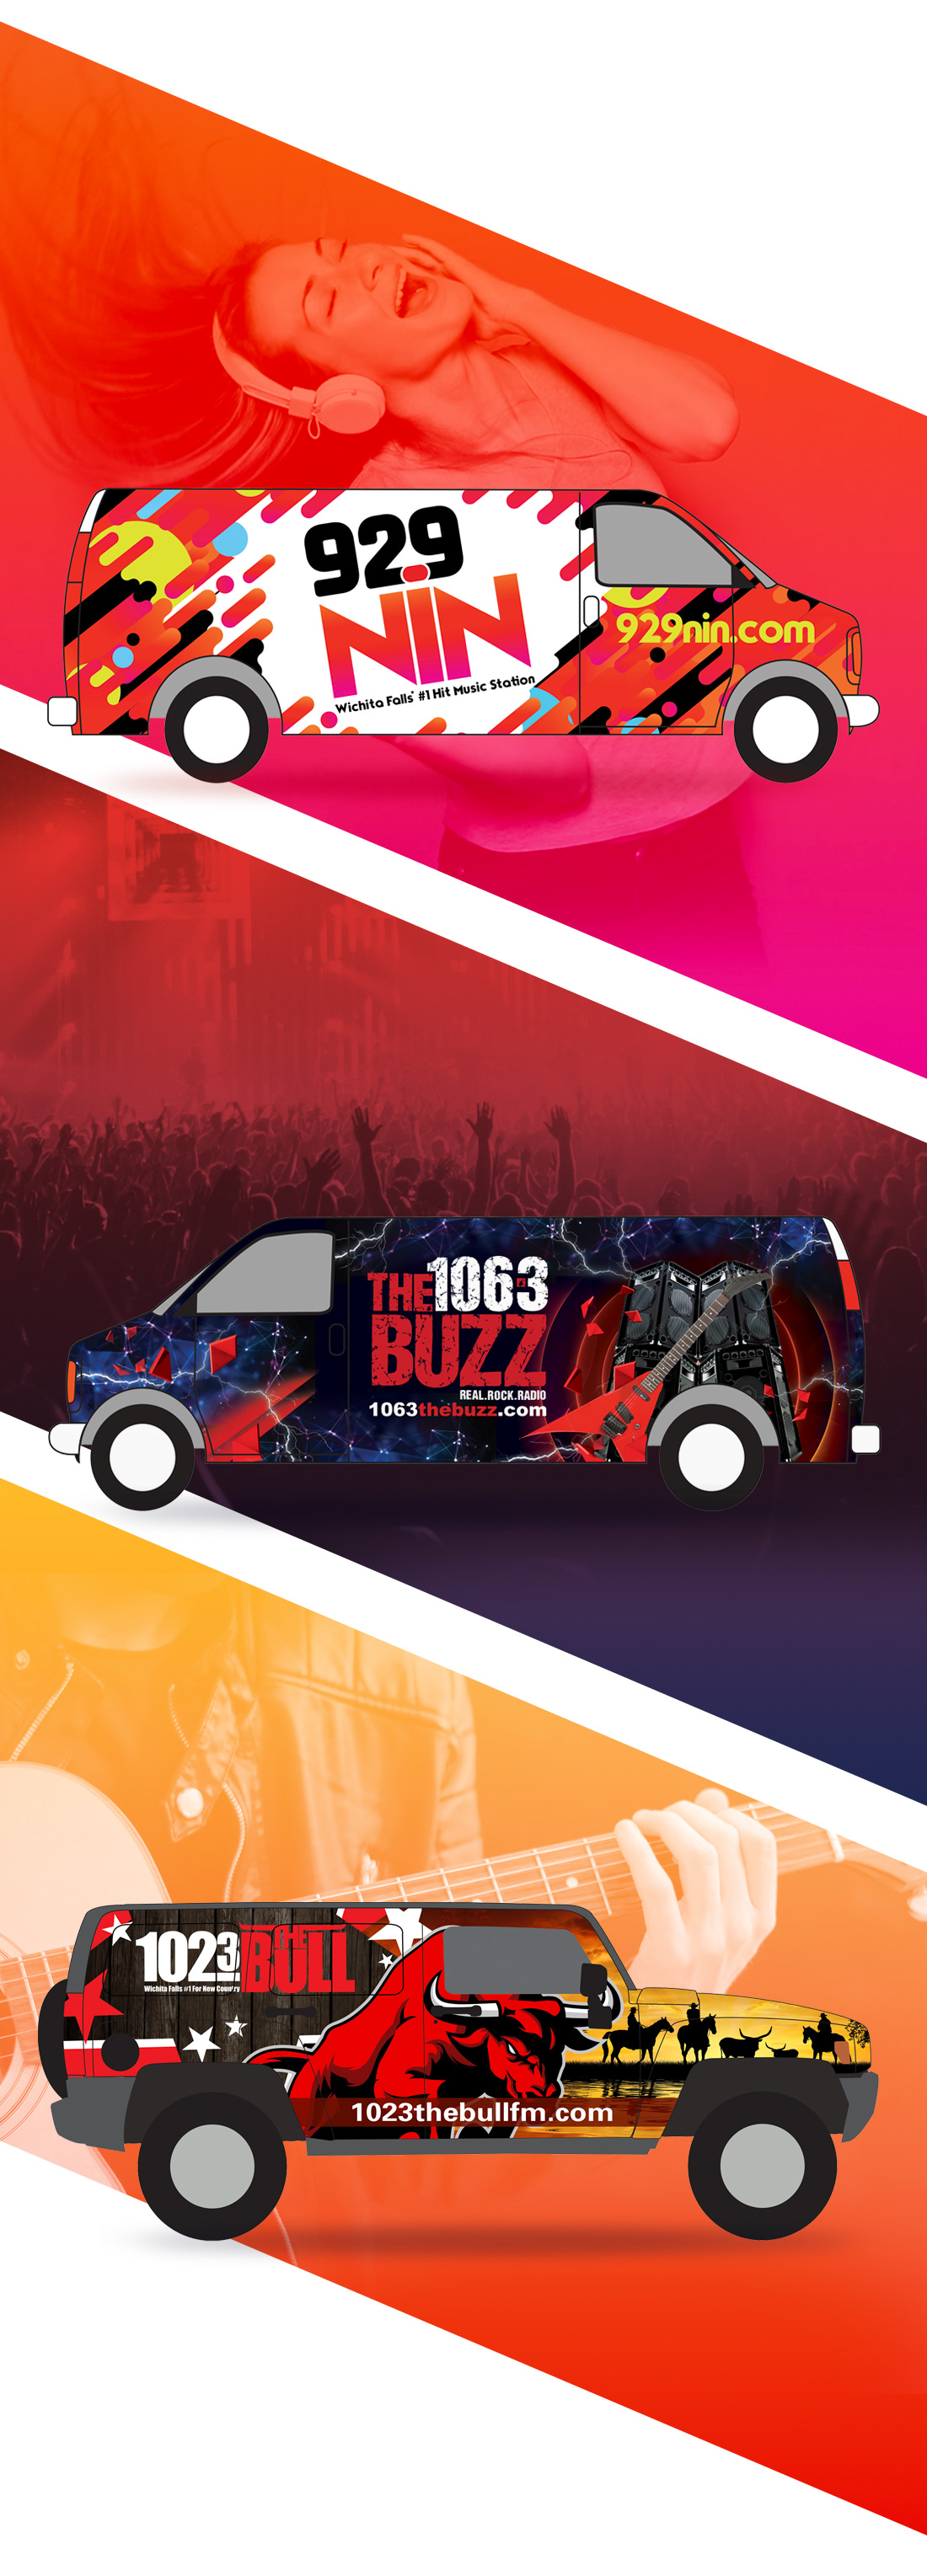 929-logo-car-wrap2